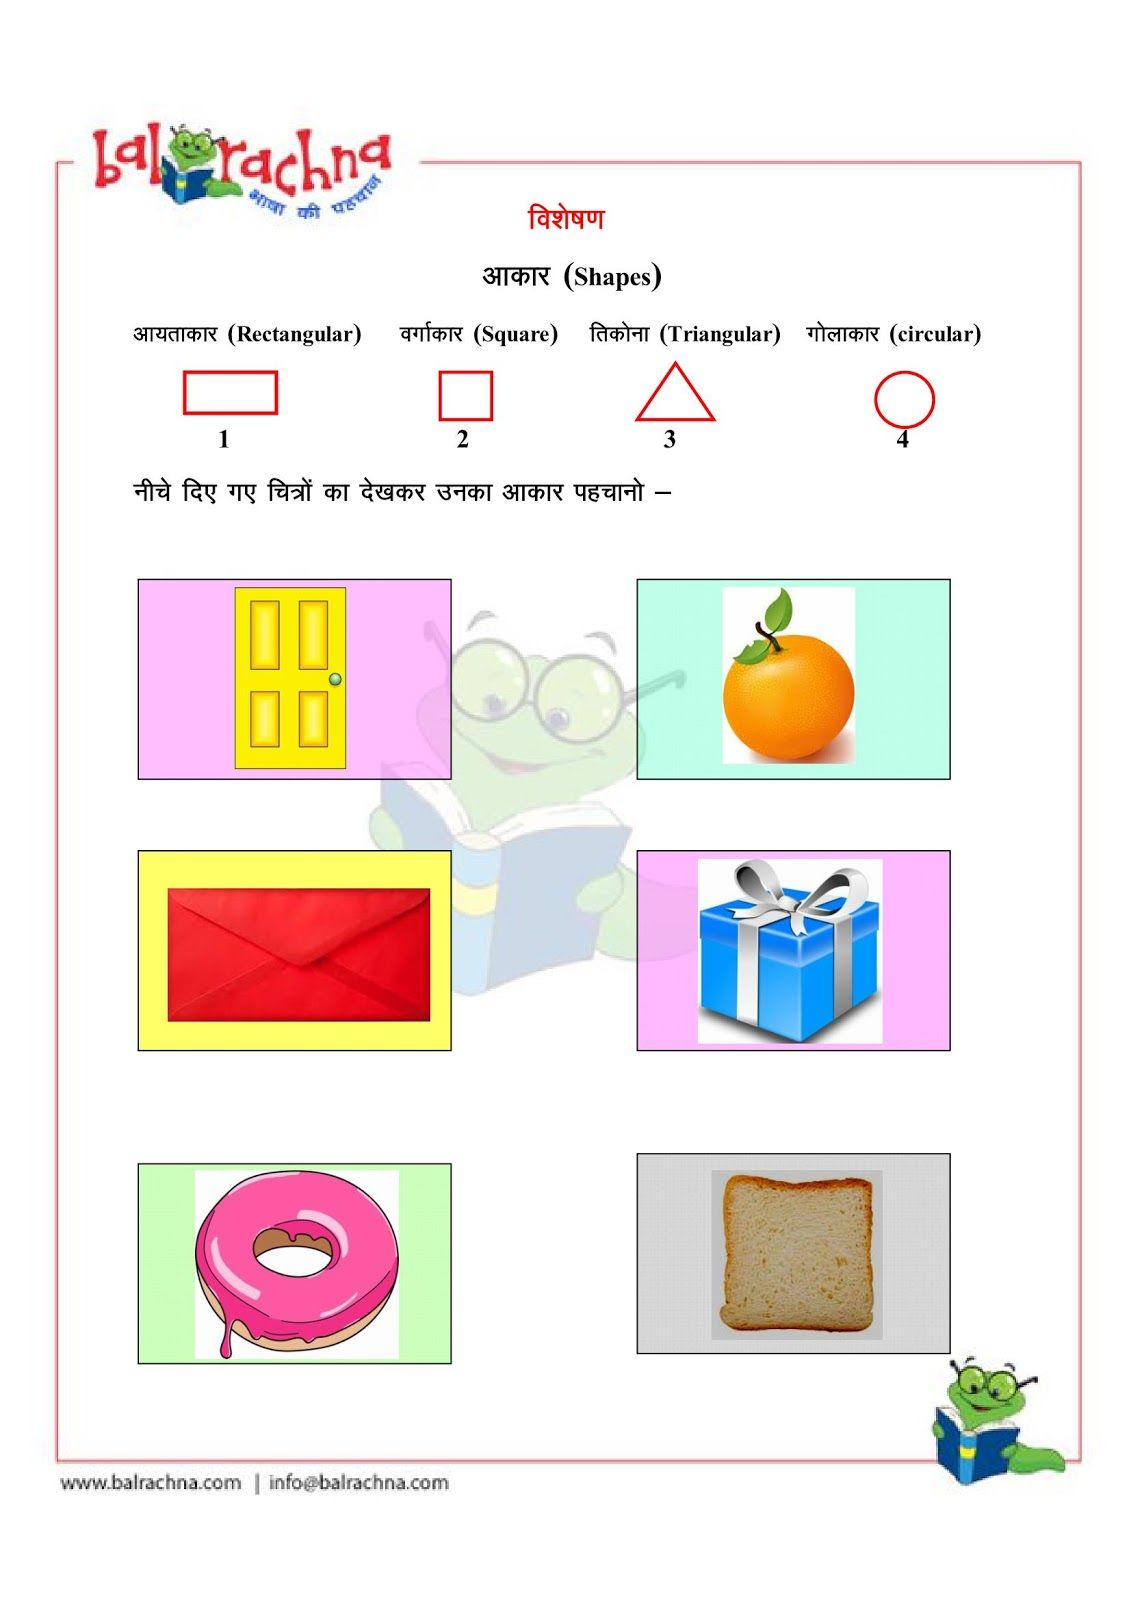 Balrachna Visheshan Adjective